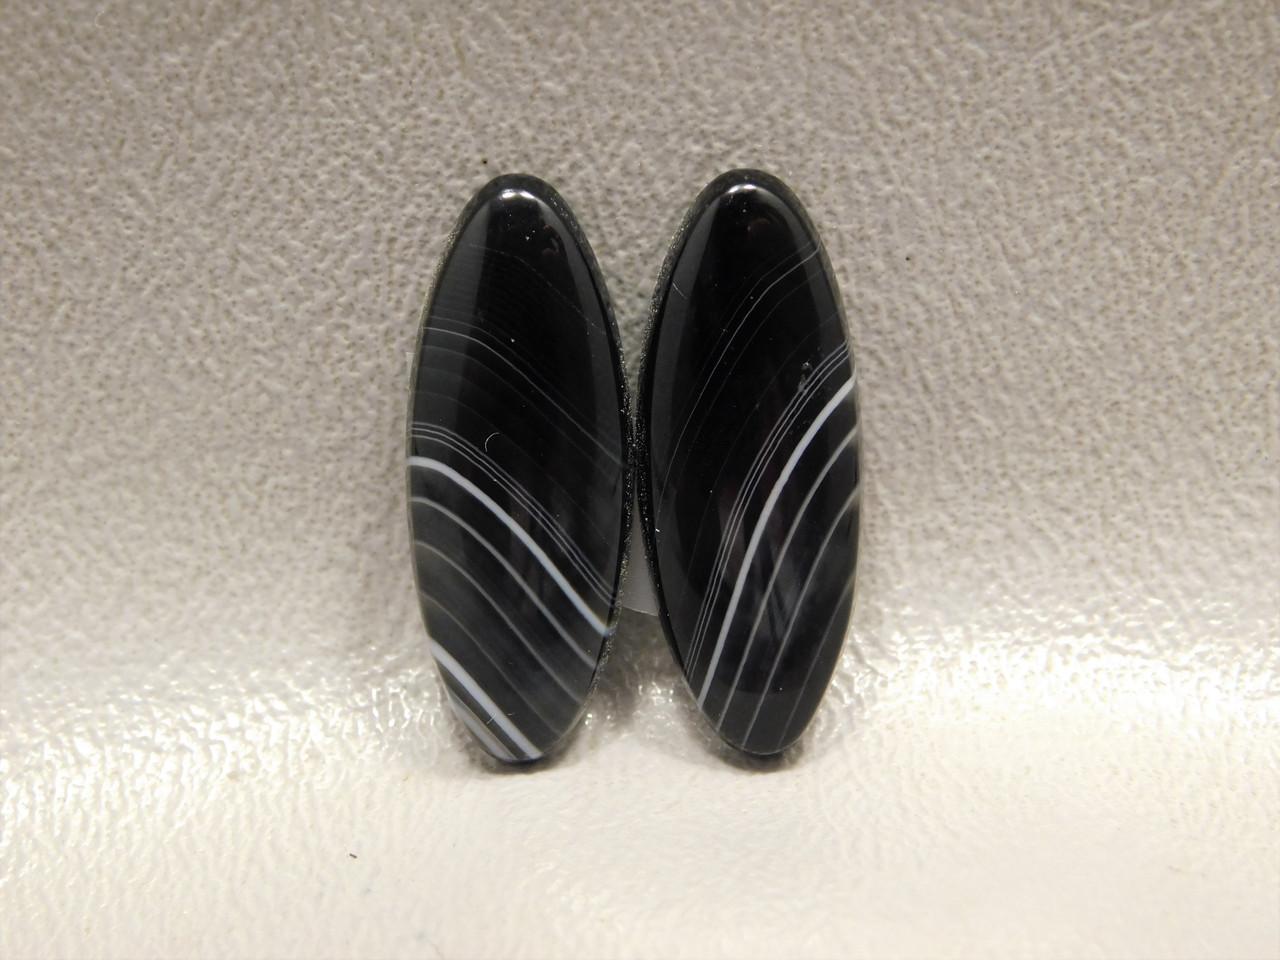 Cabochons Tuxedo Agate Semi Precious Matched Pair Stones #22